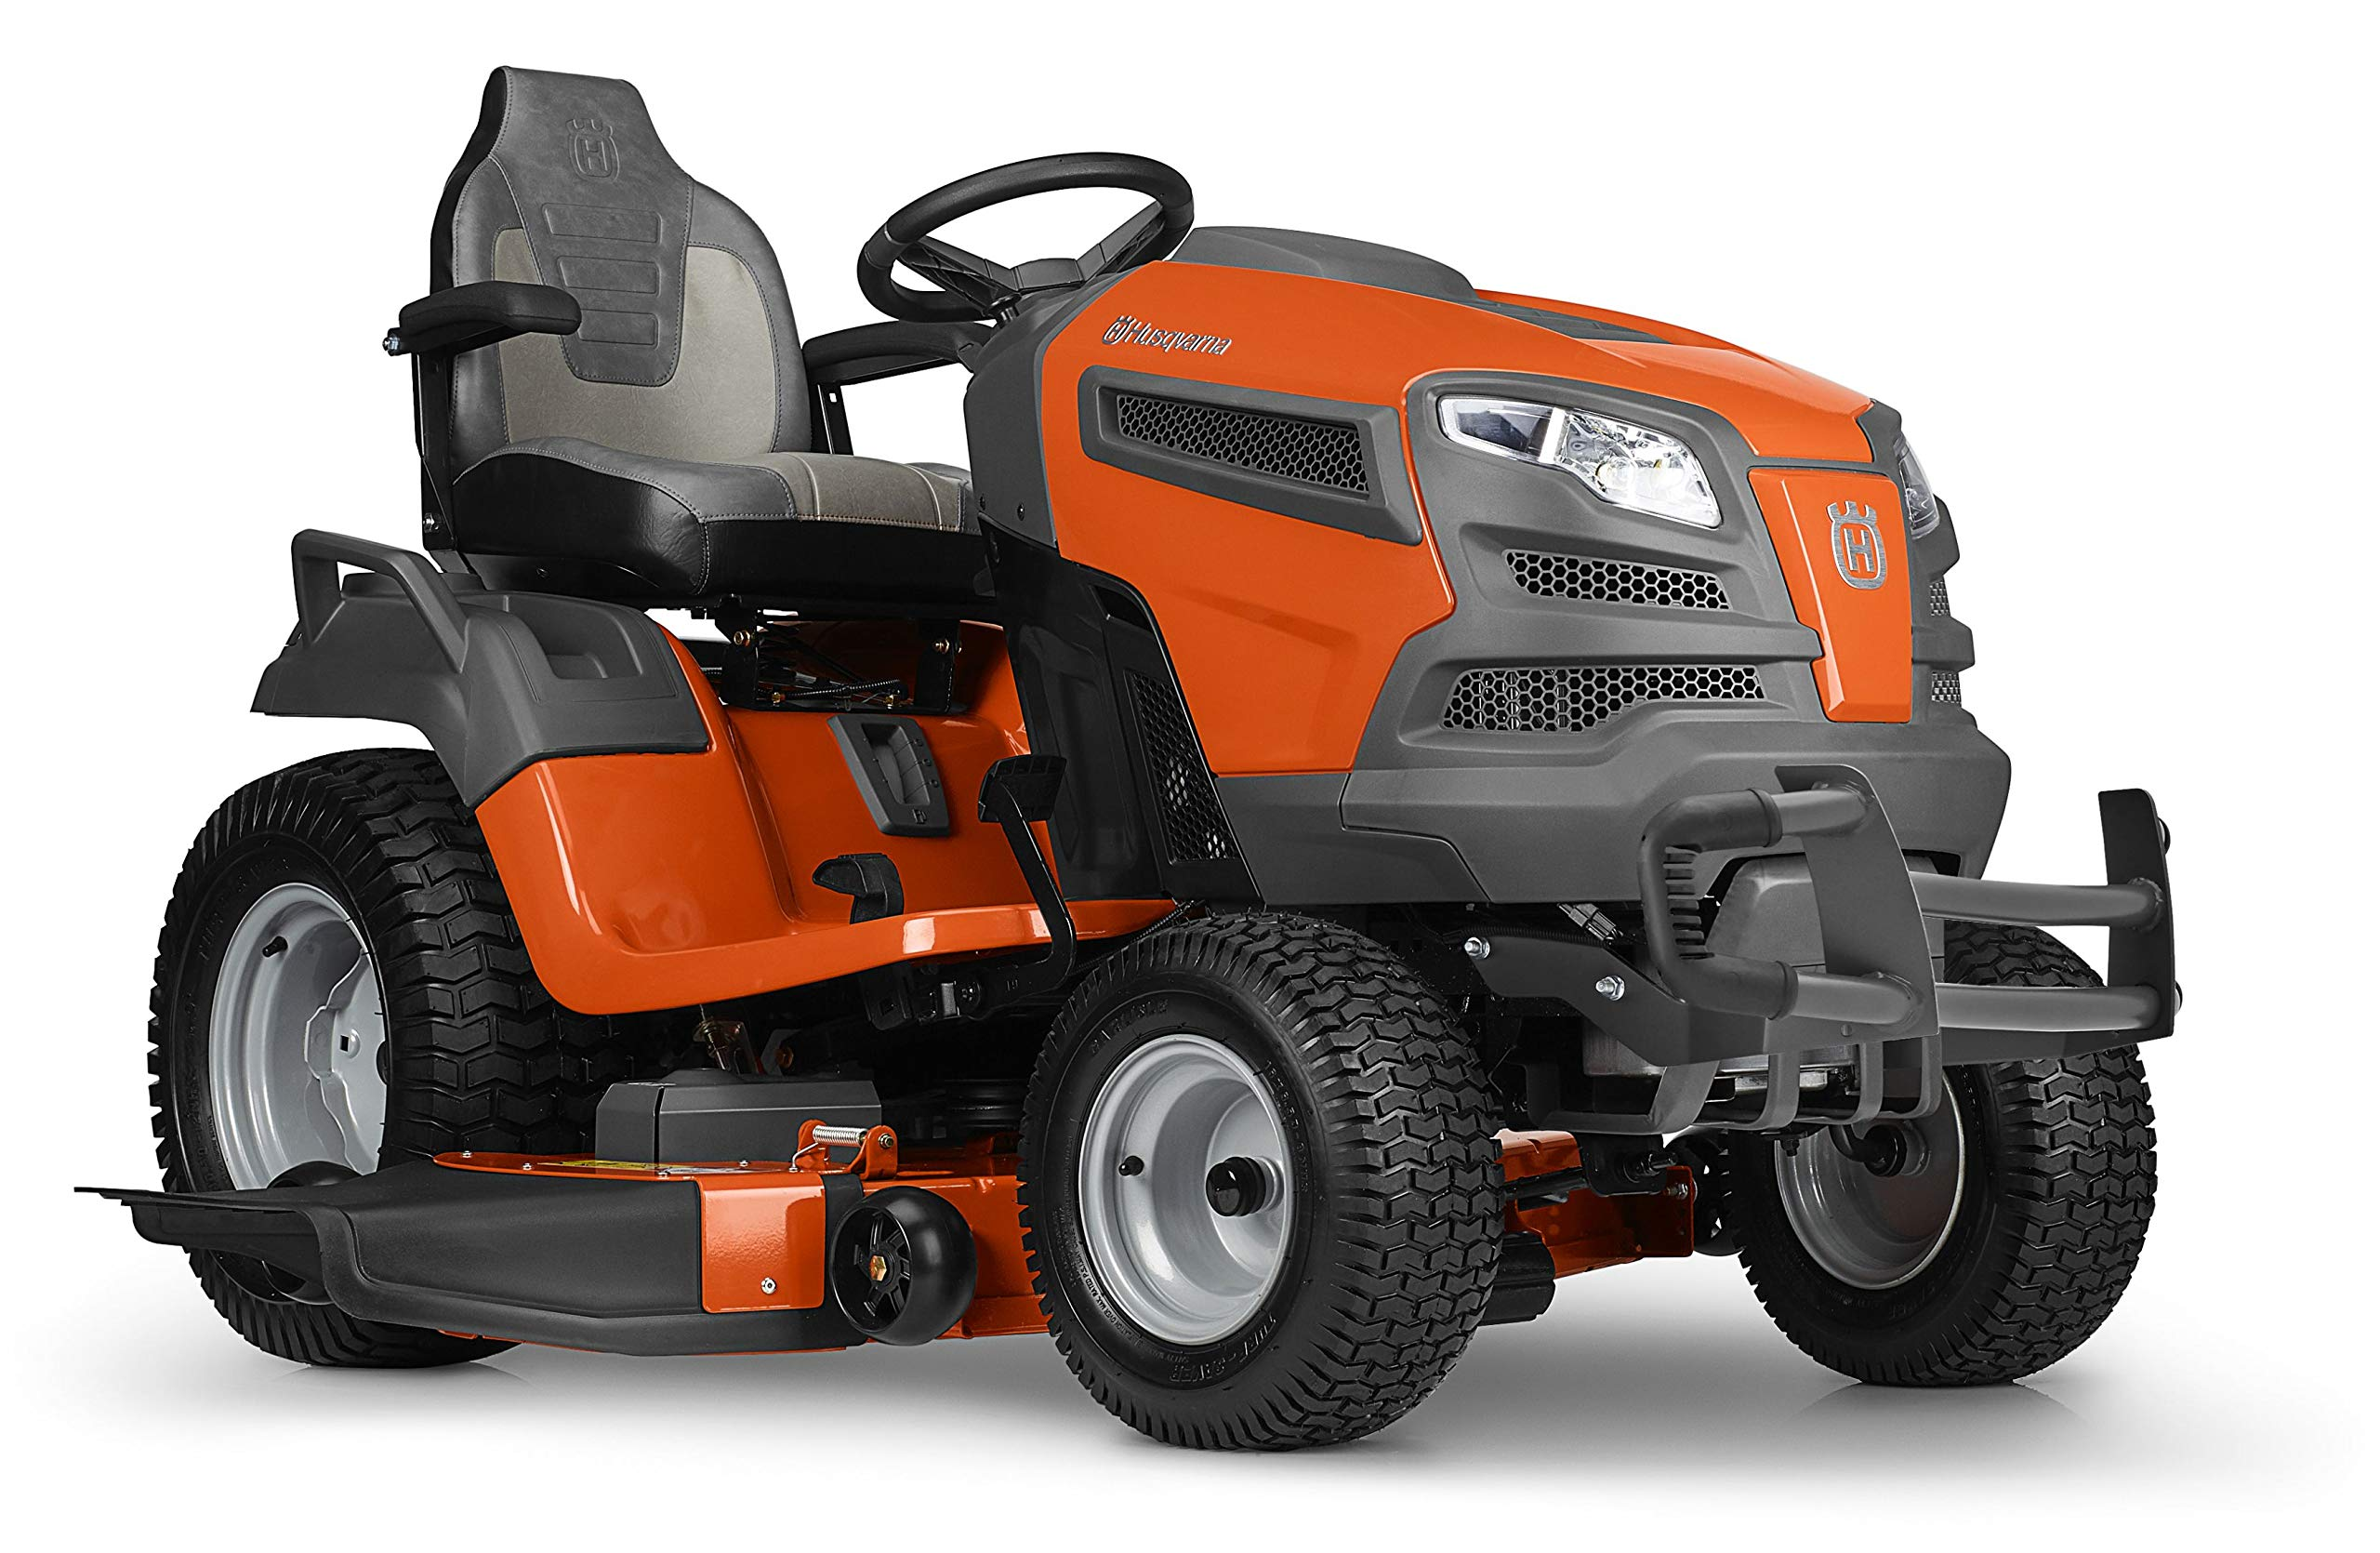 Husqvarna TS354XD (54'') 26HP Kohler Lawn Tractor 960430290 by Husqvarna